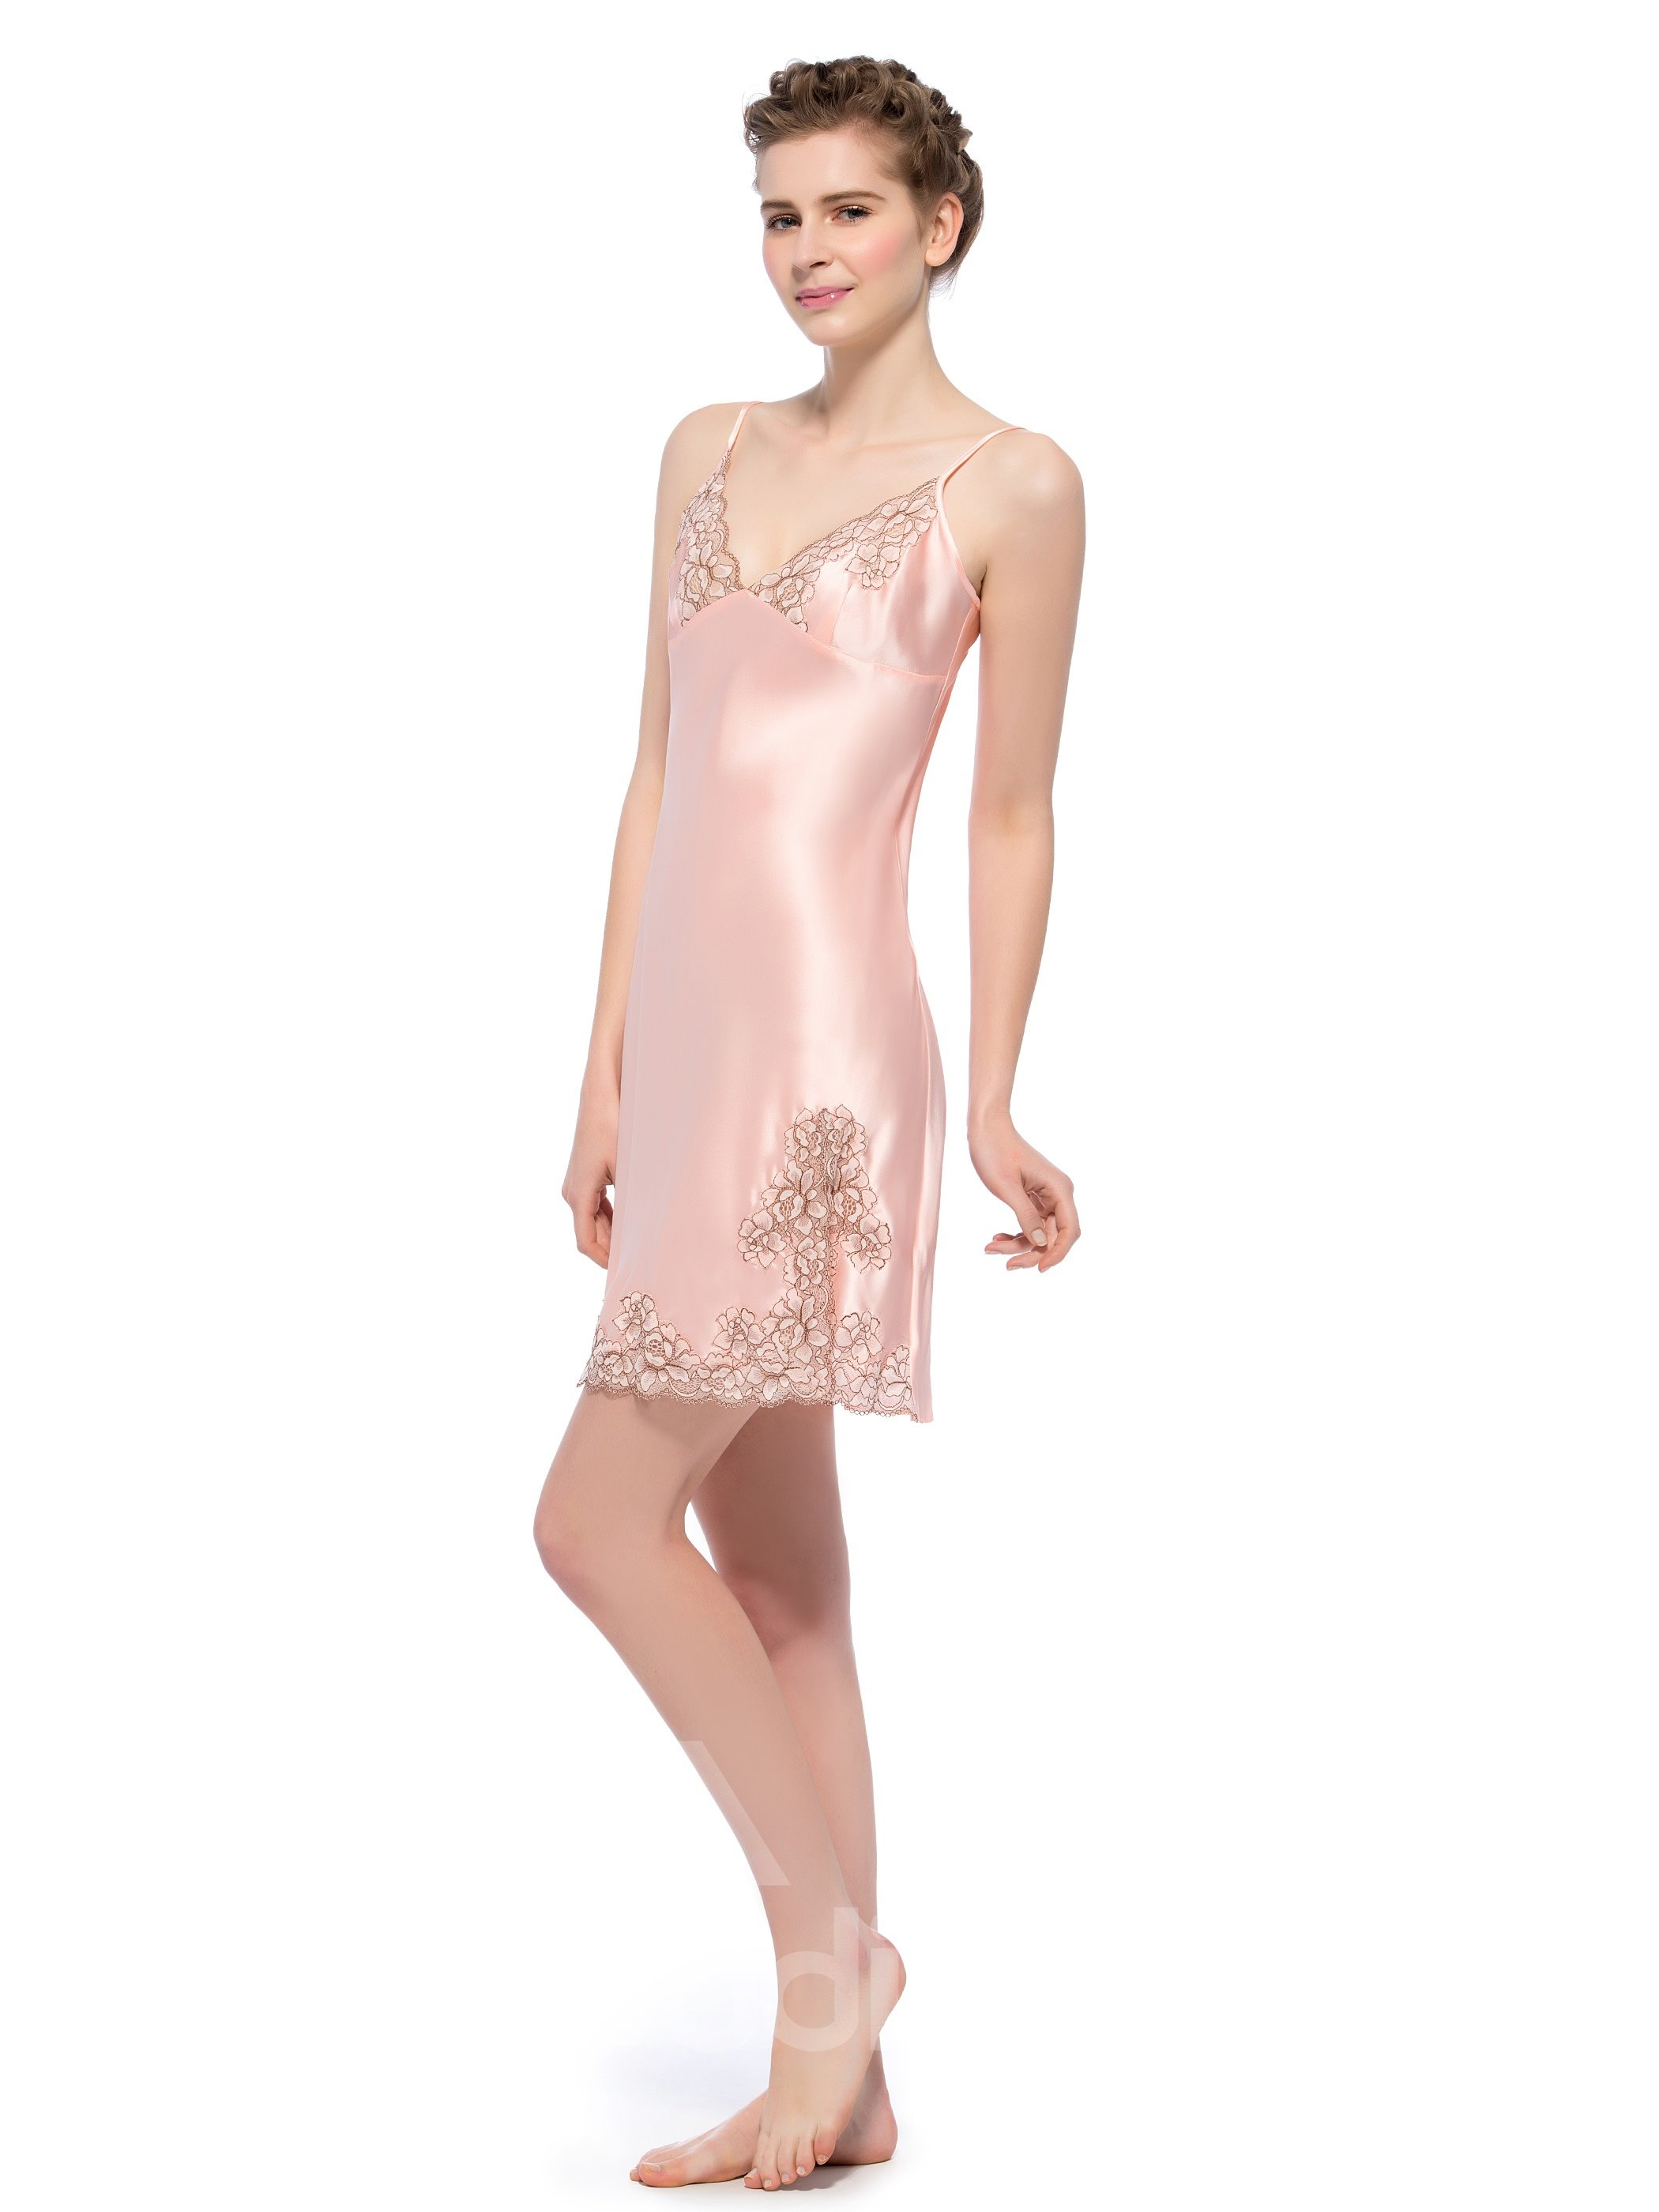 Elegant Deep-V Flowers Lace Trim Mulberry Silk Chemise